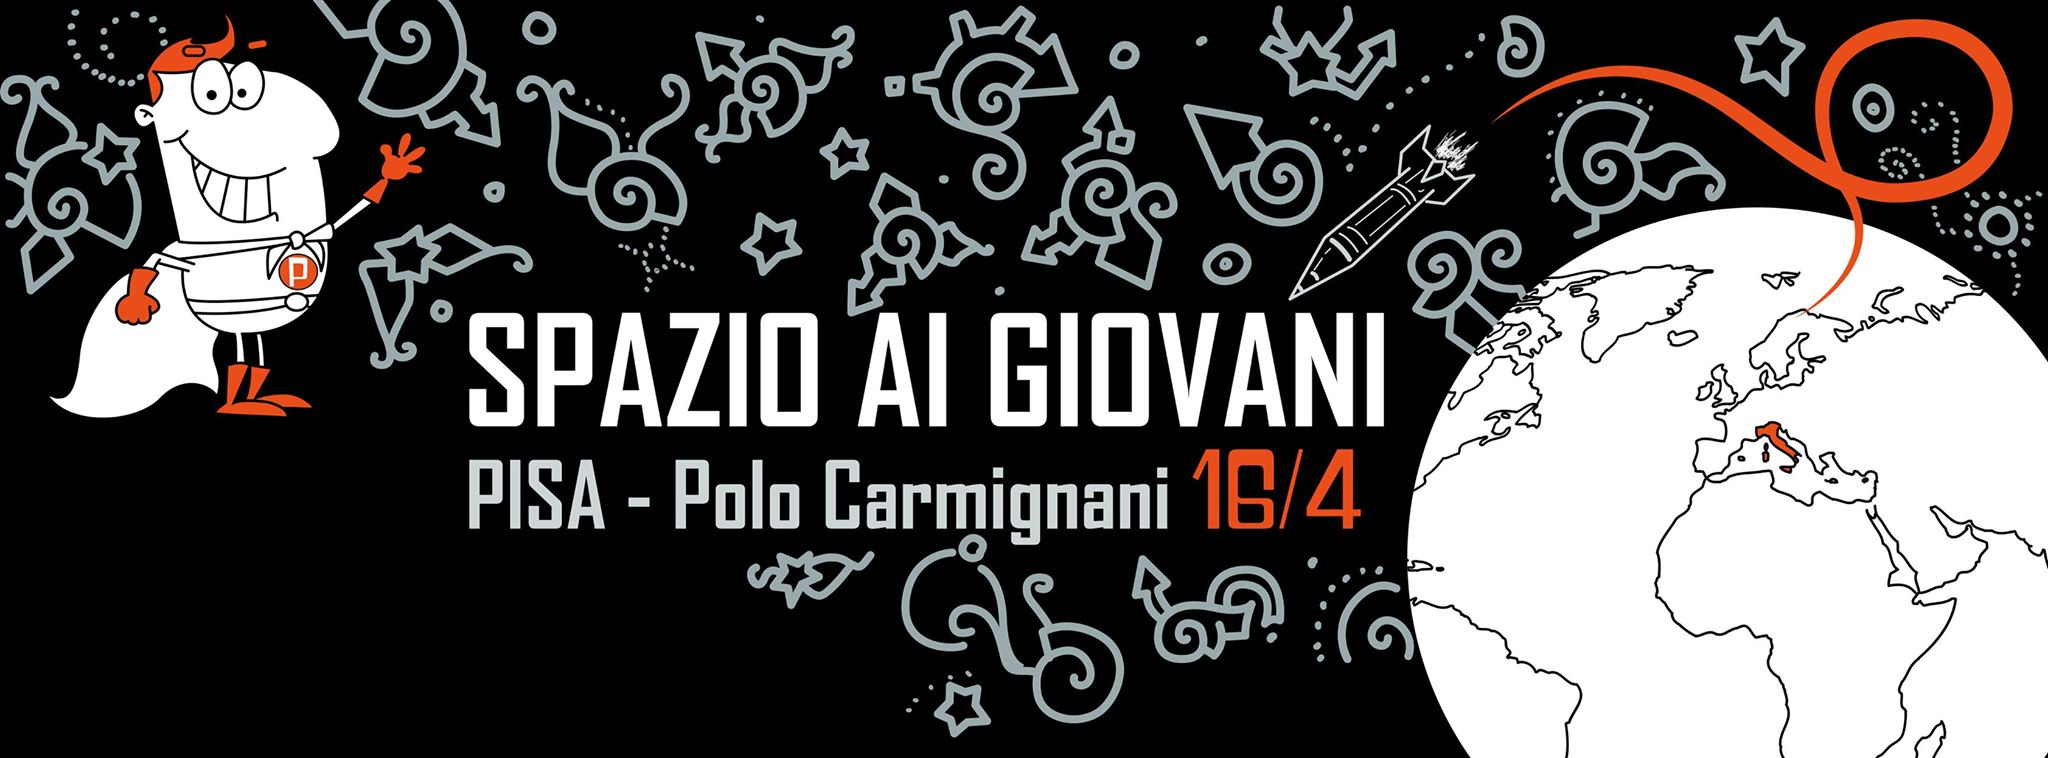 SpazioAiGiovani-PhosProject-2015